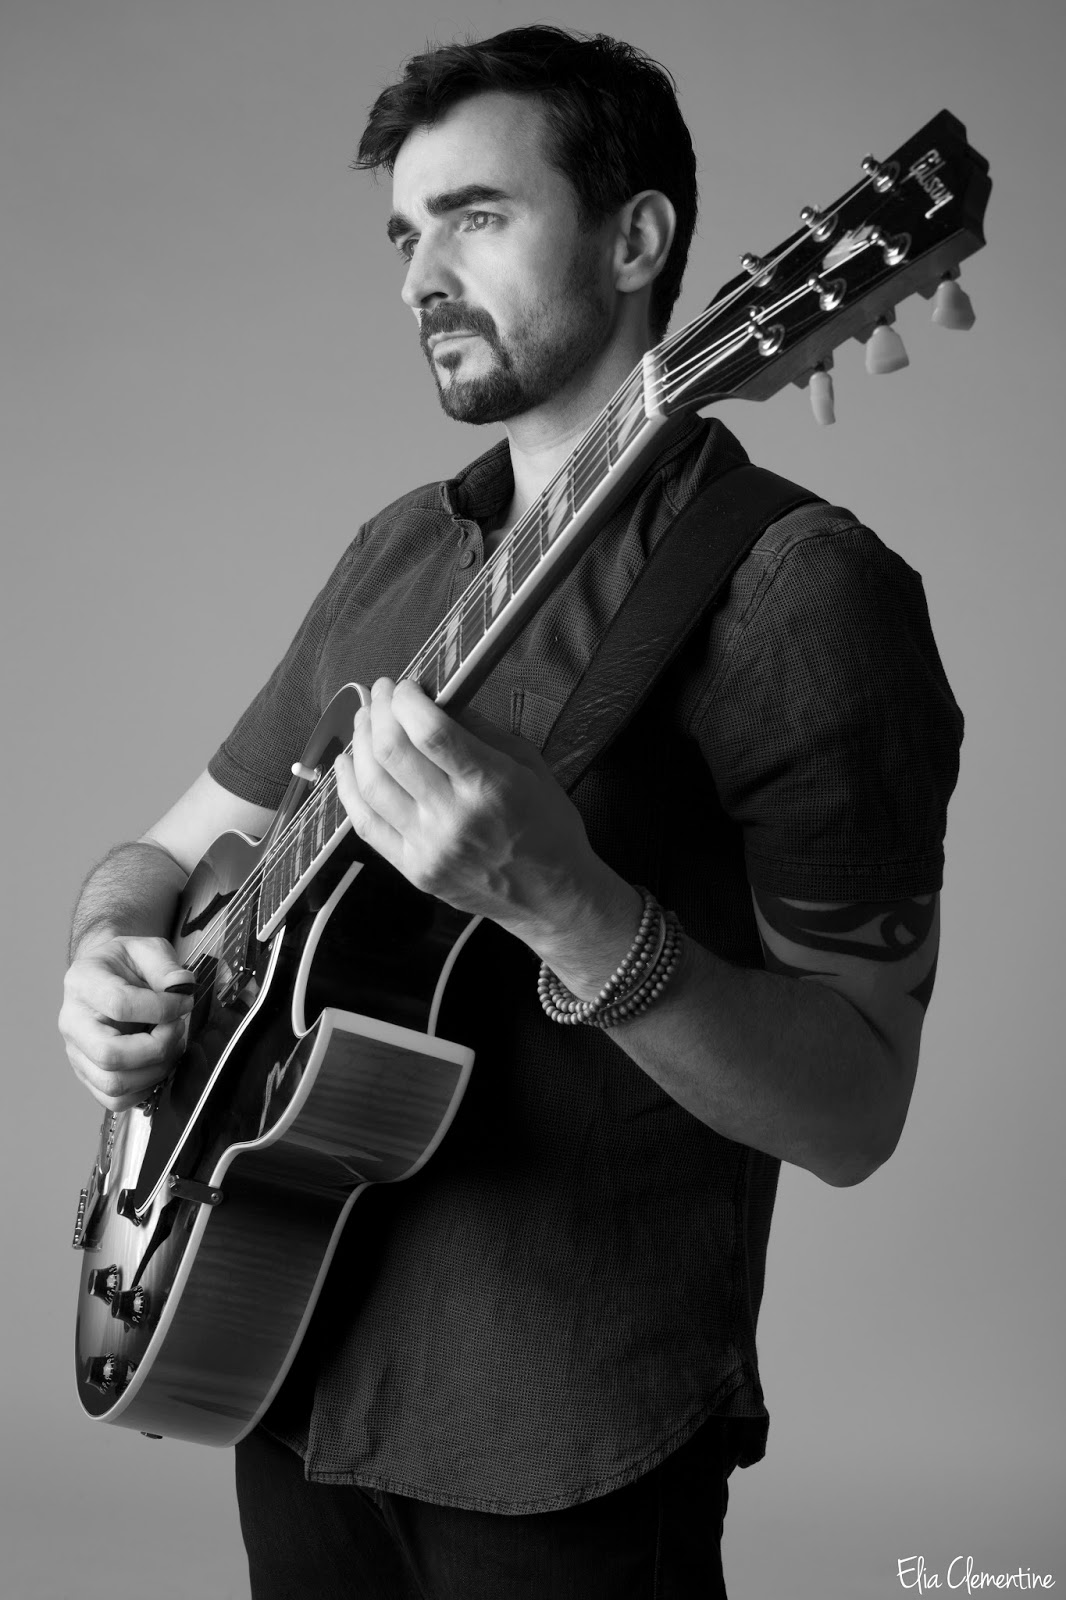 Javier Sánchez comienza las masterclass de Mousikê en 2019